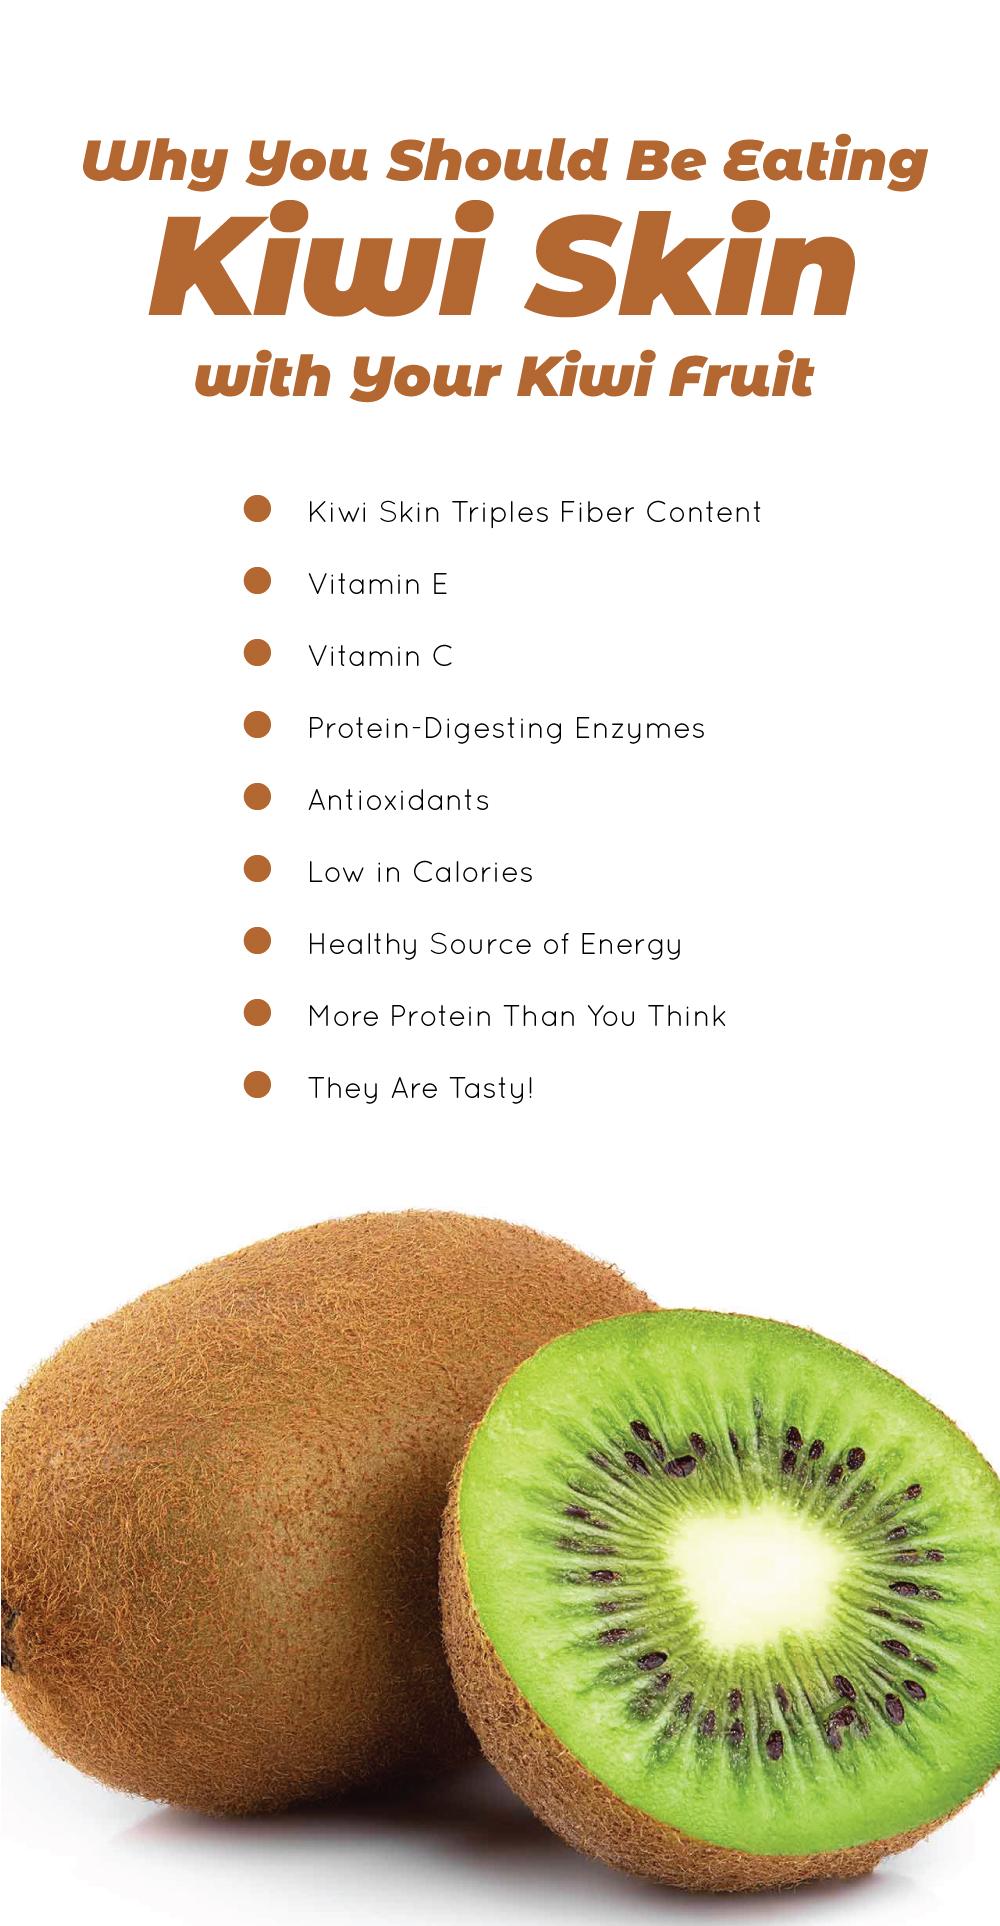 Why You Should Be Eating Kiwi Skin with Your Kiwi Fruit